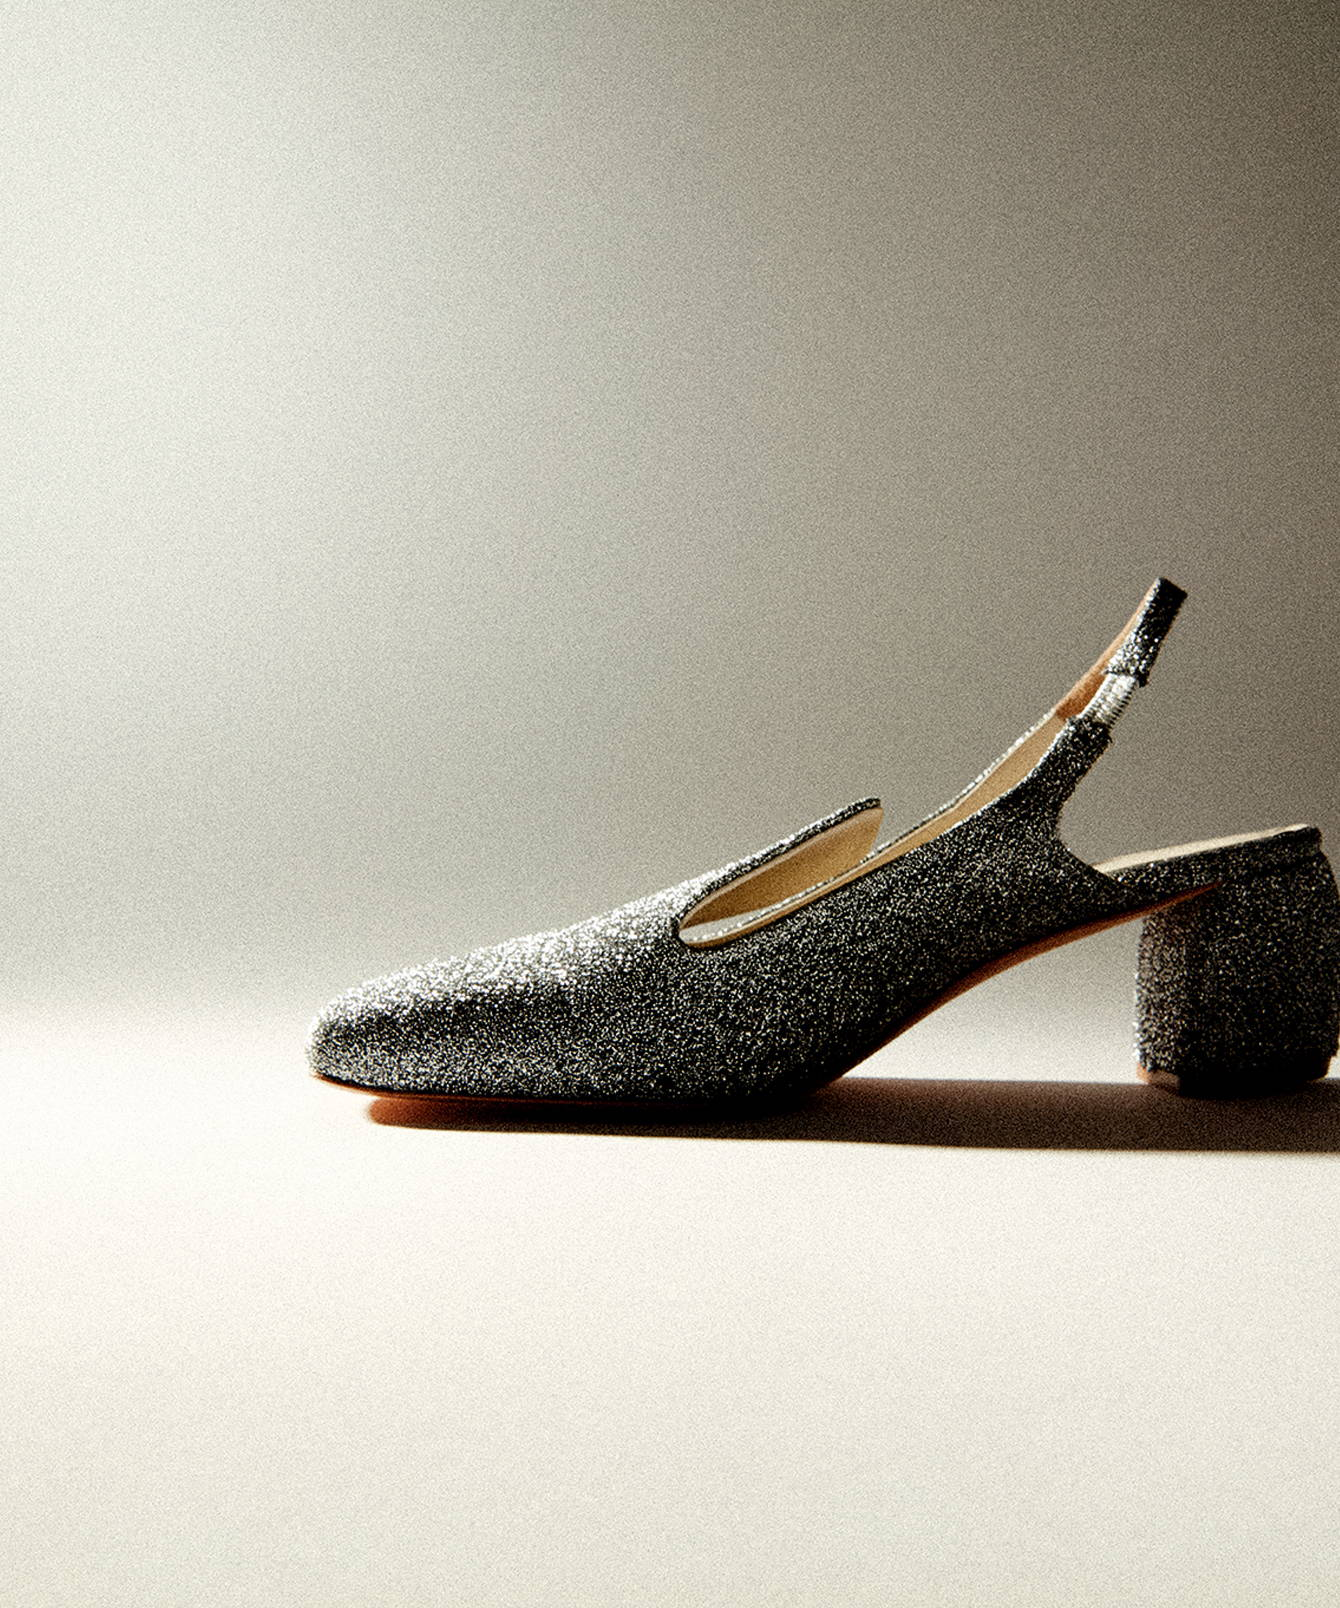 2019 Gift Guide image of evon heel